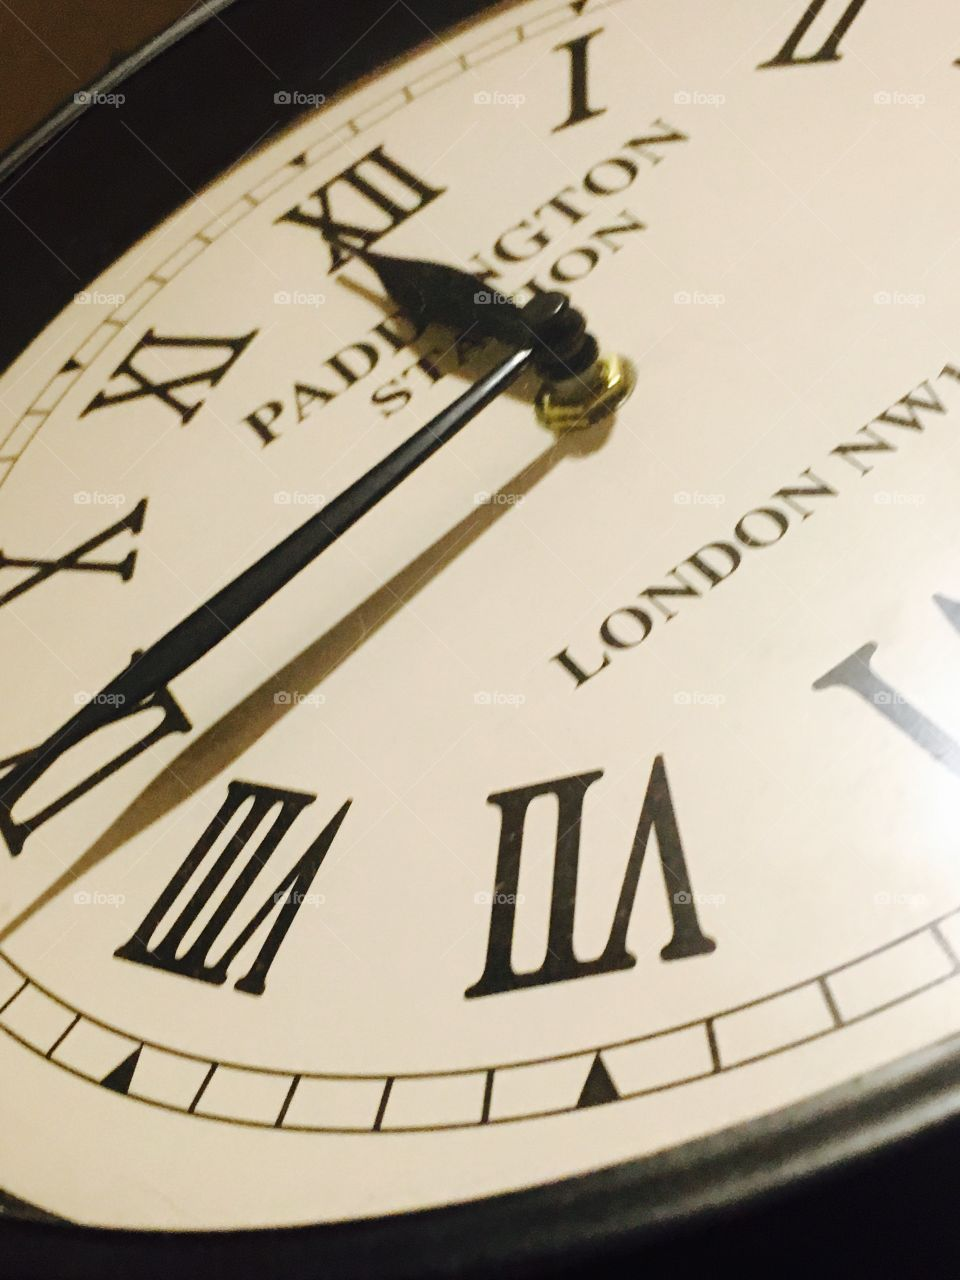 Paddington Station style clock.